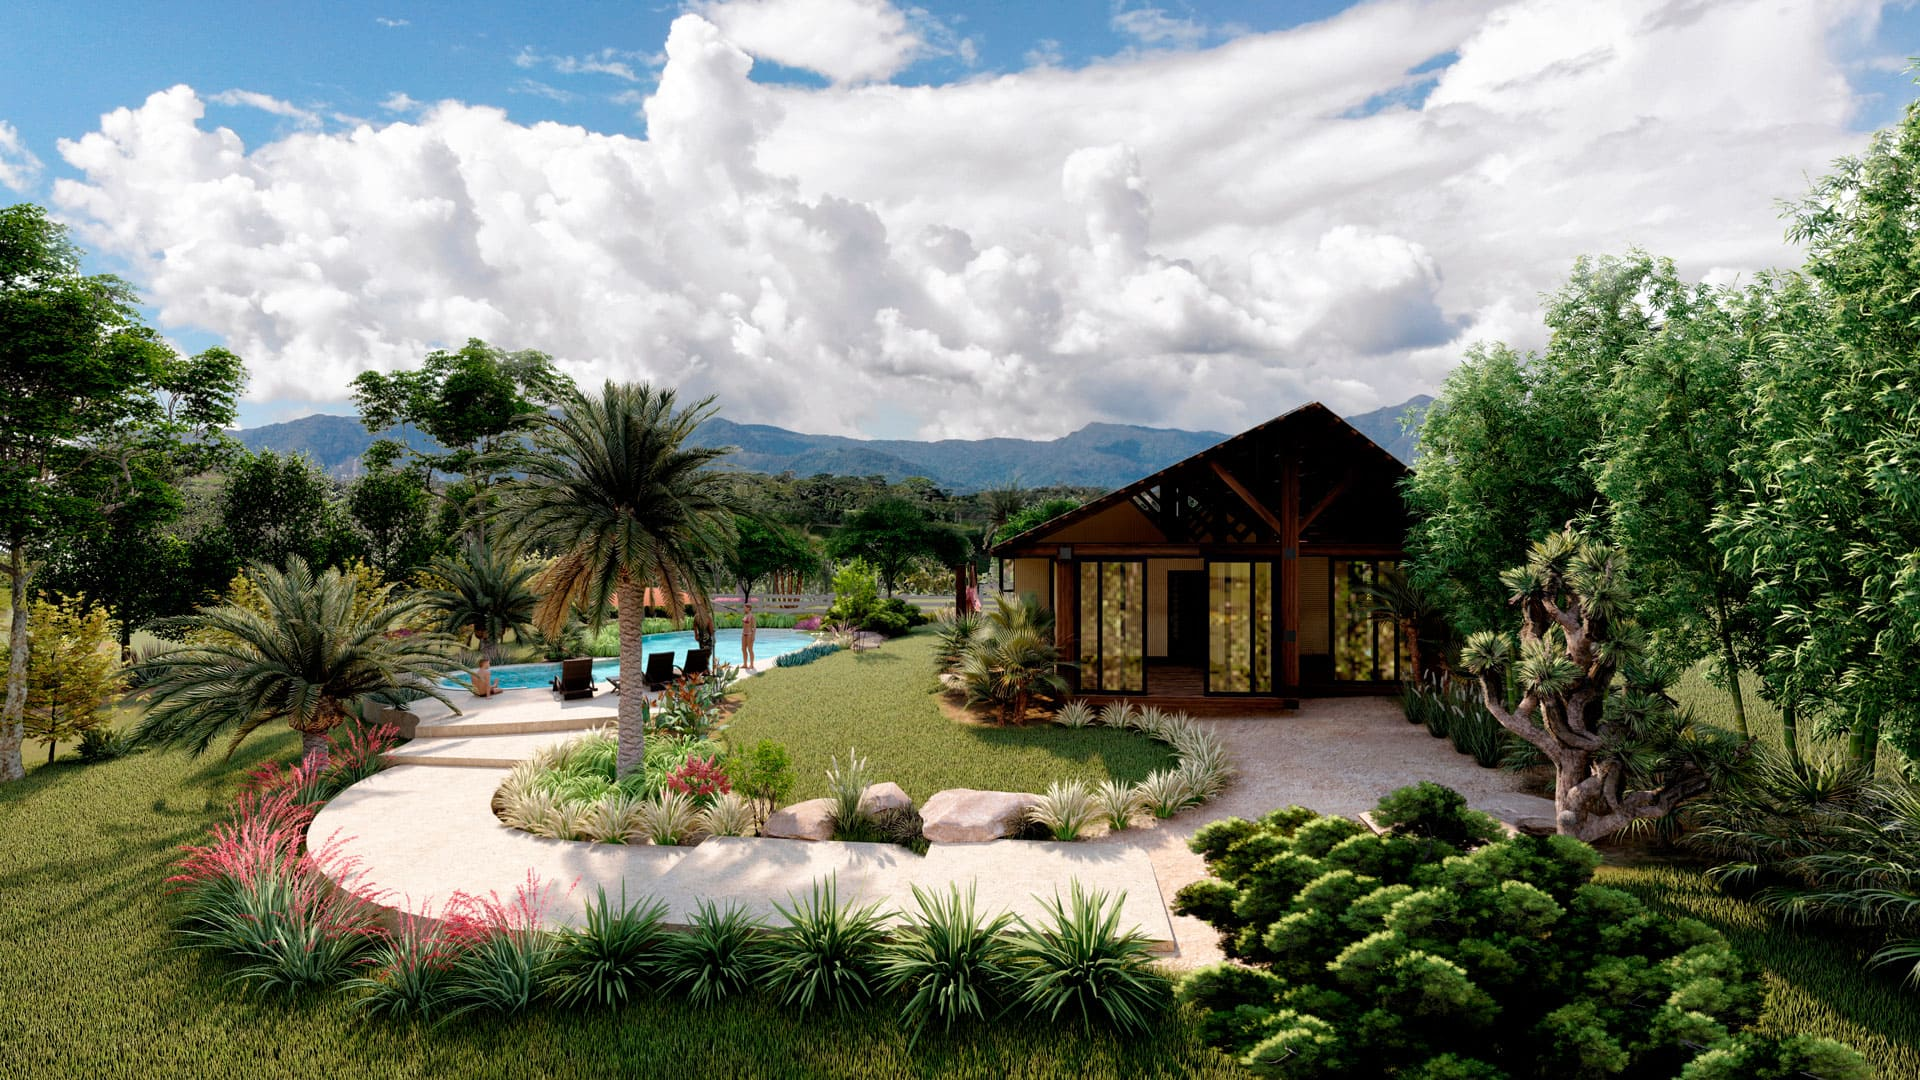 Casa modular con cielo azul en Yanashpa Village, Tarapoto